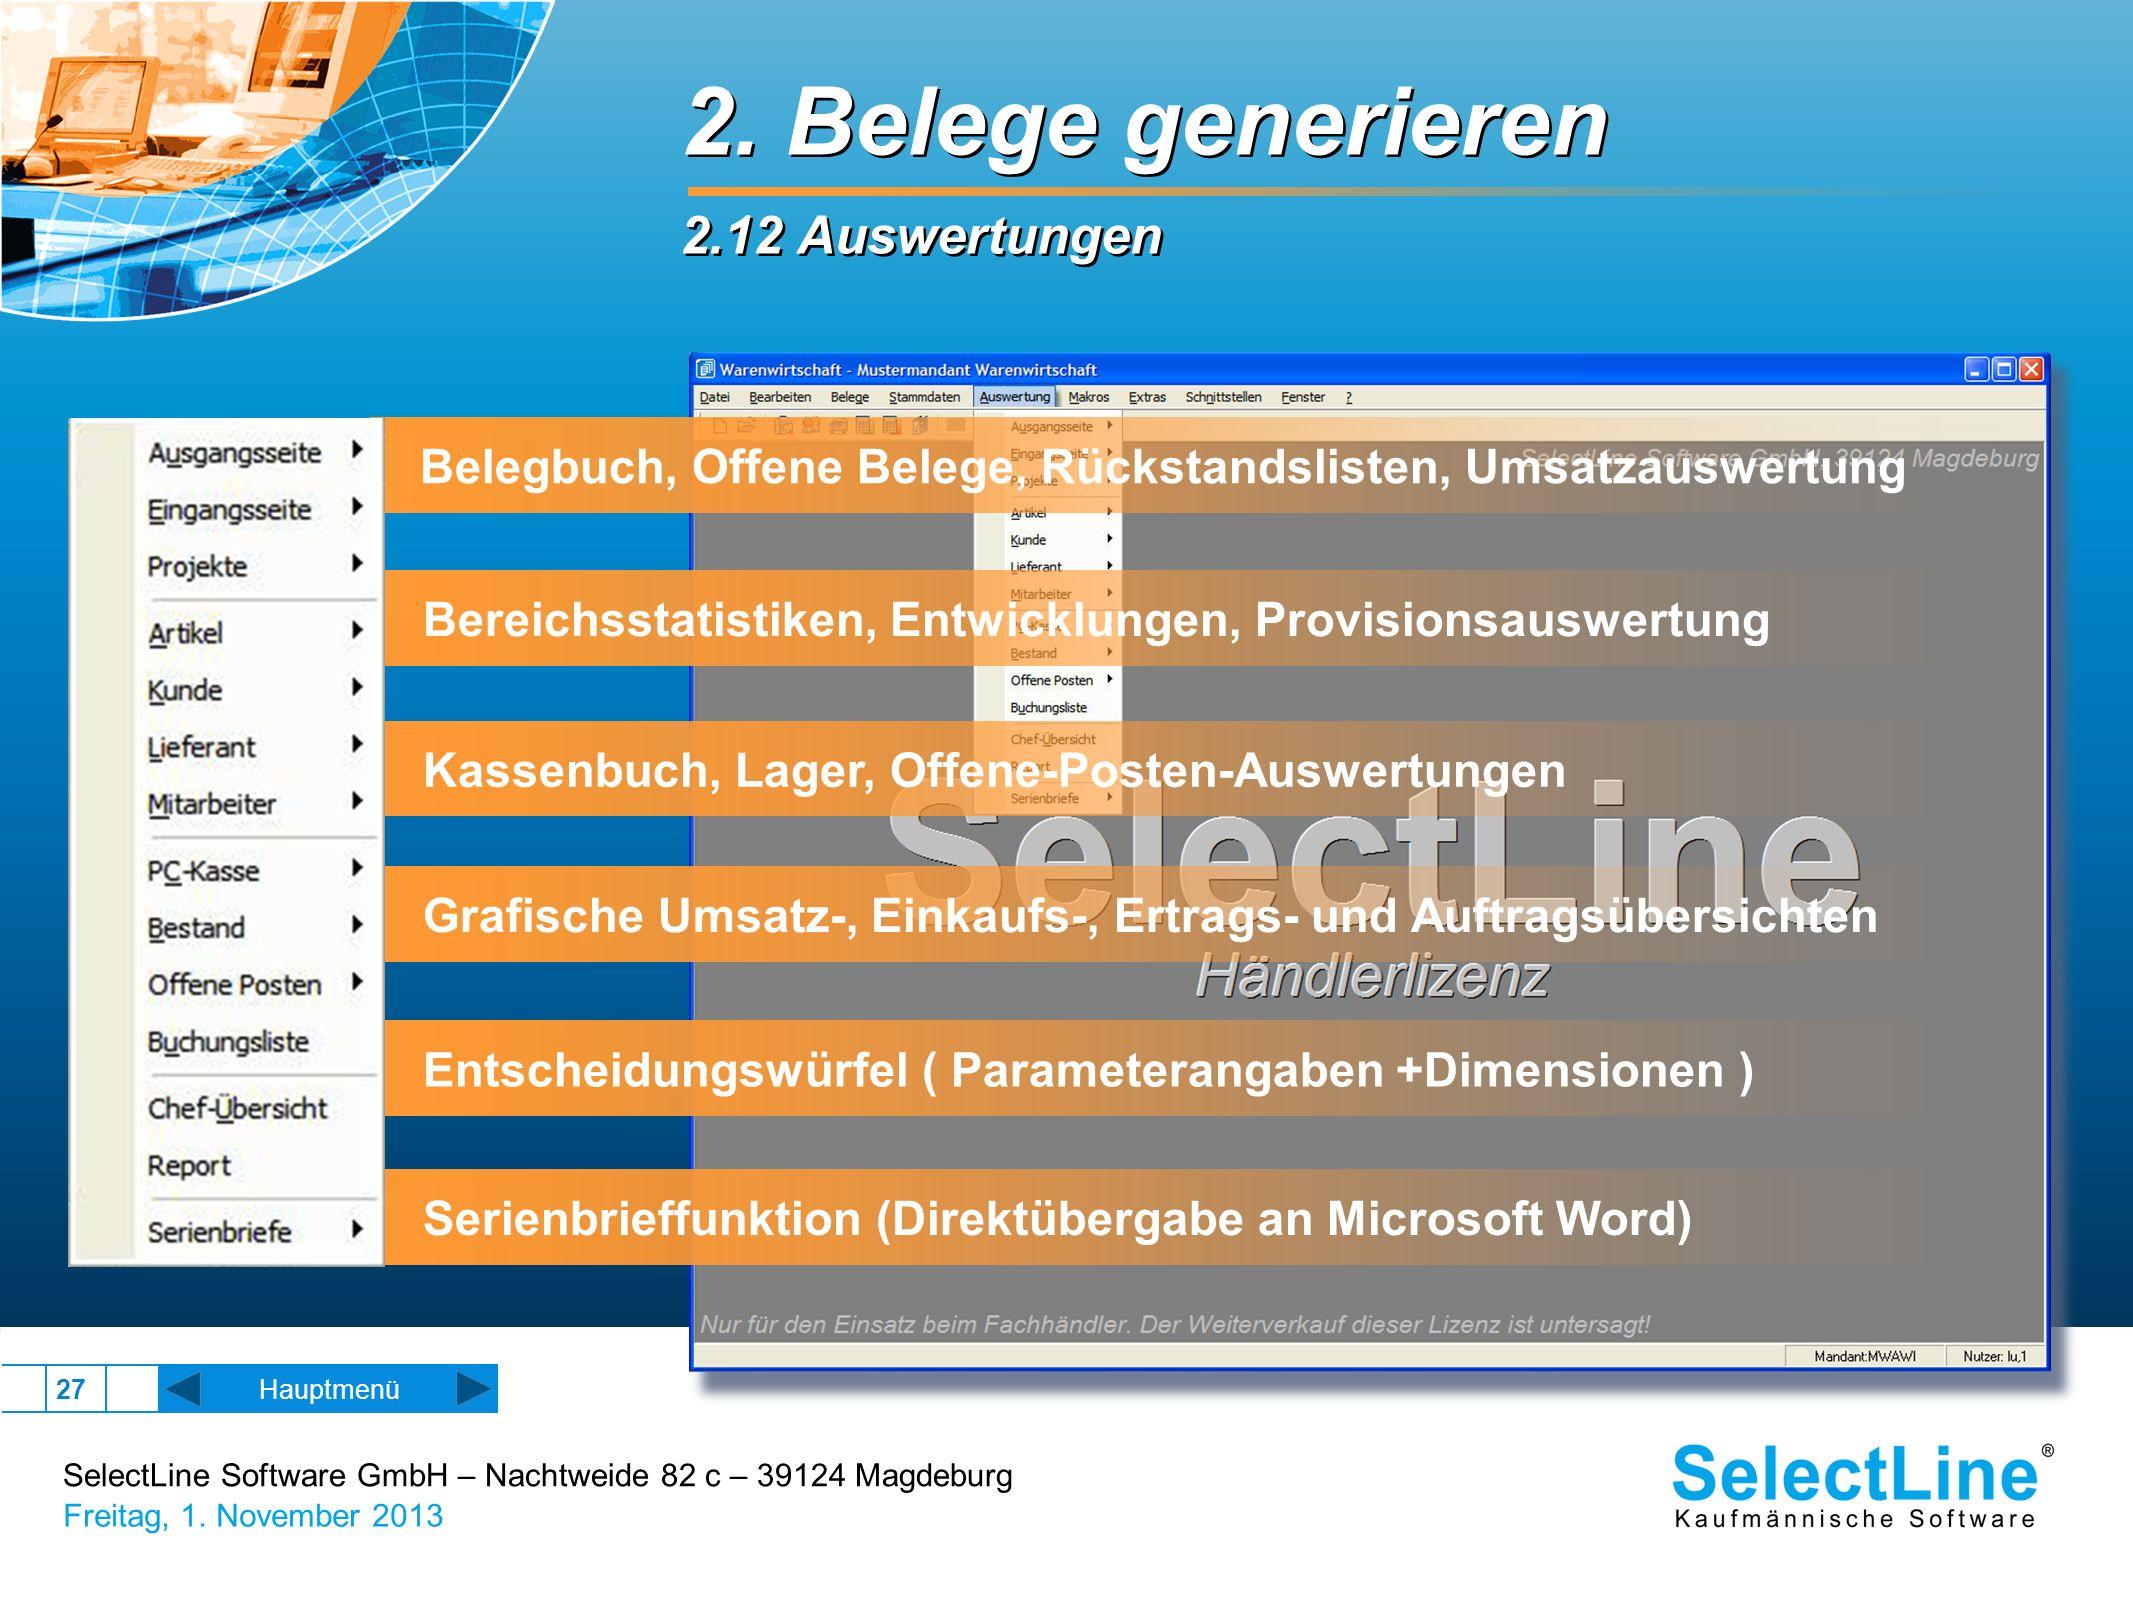 SelectLine Software GmbH – Nachtweide 82 c – 39124 Magdeburg Freitag, 1. November 2013 27 2. Belege generieren 2.12 Auswertungen 2. Belege generieren